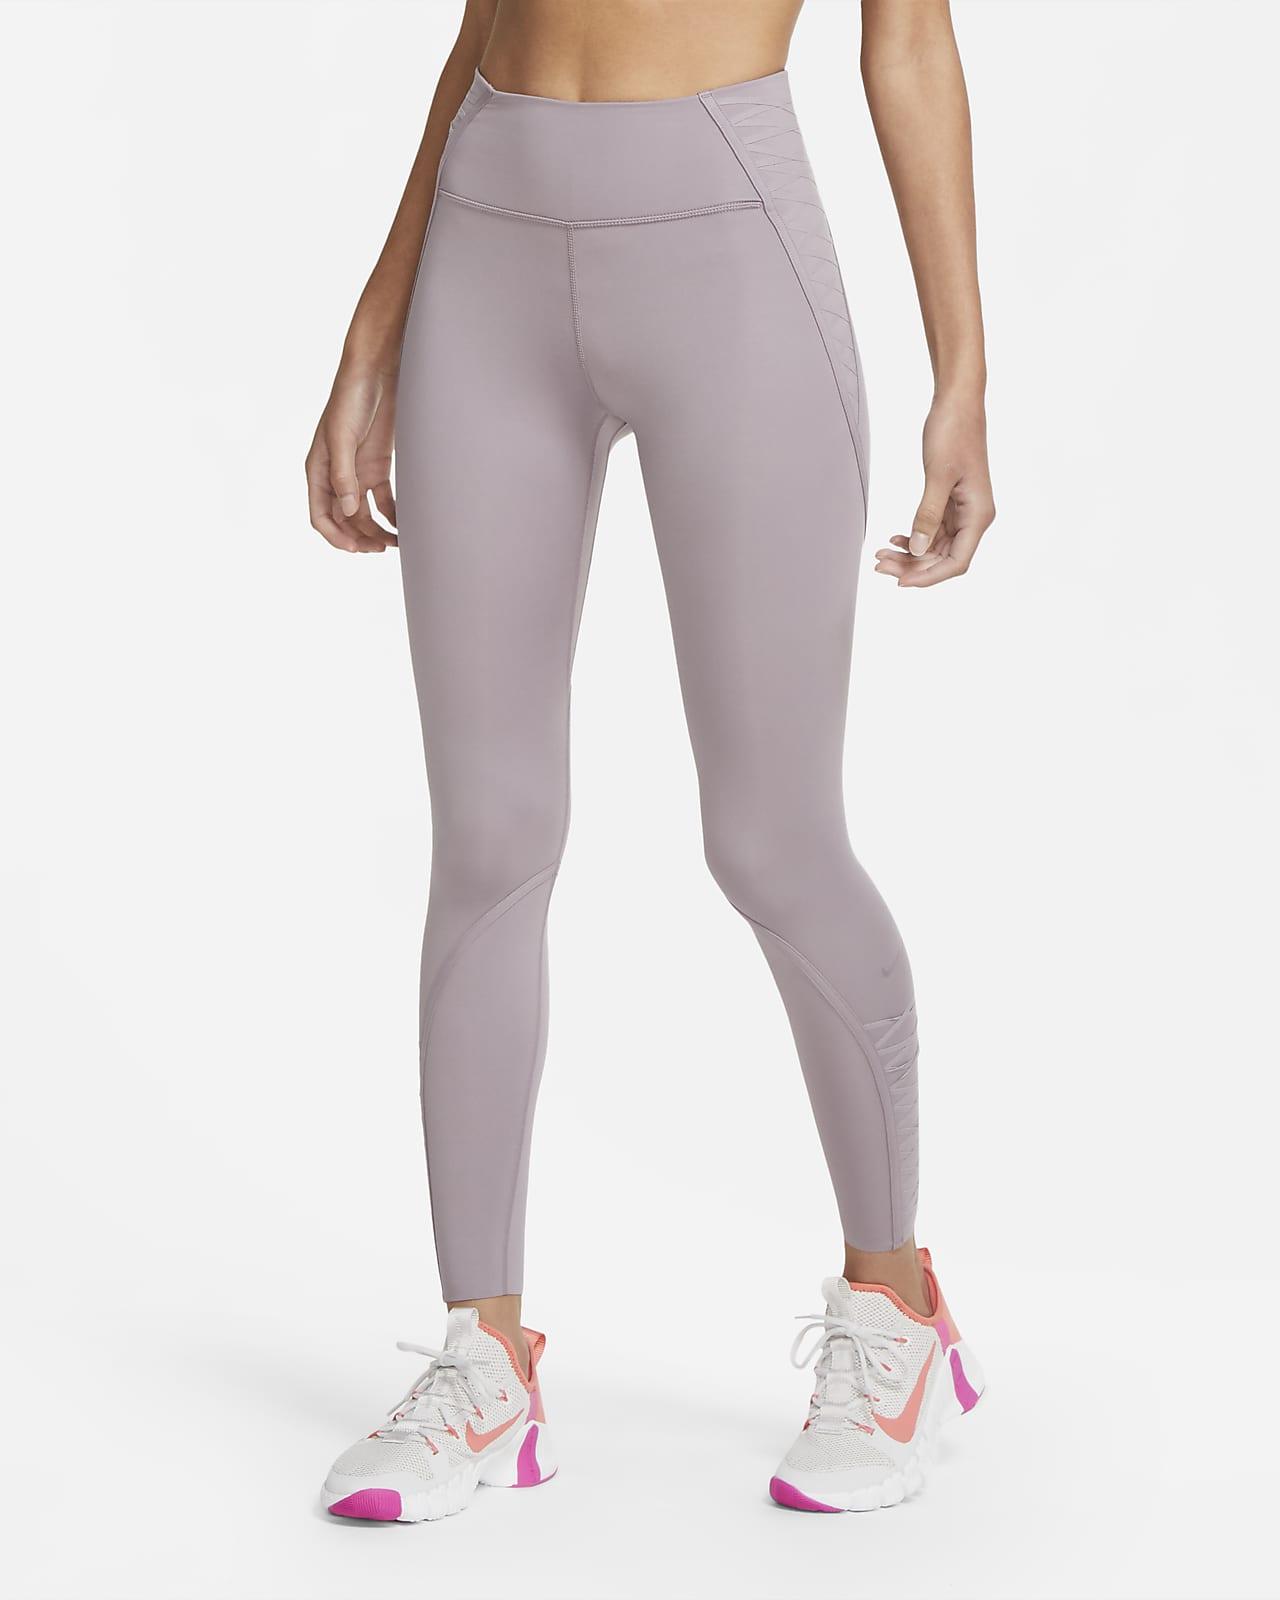 Nike One Luxe 7/8-legging met veters voor dames